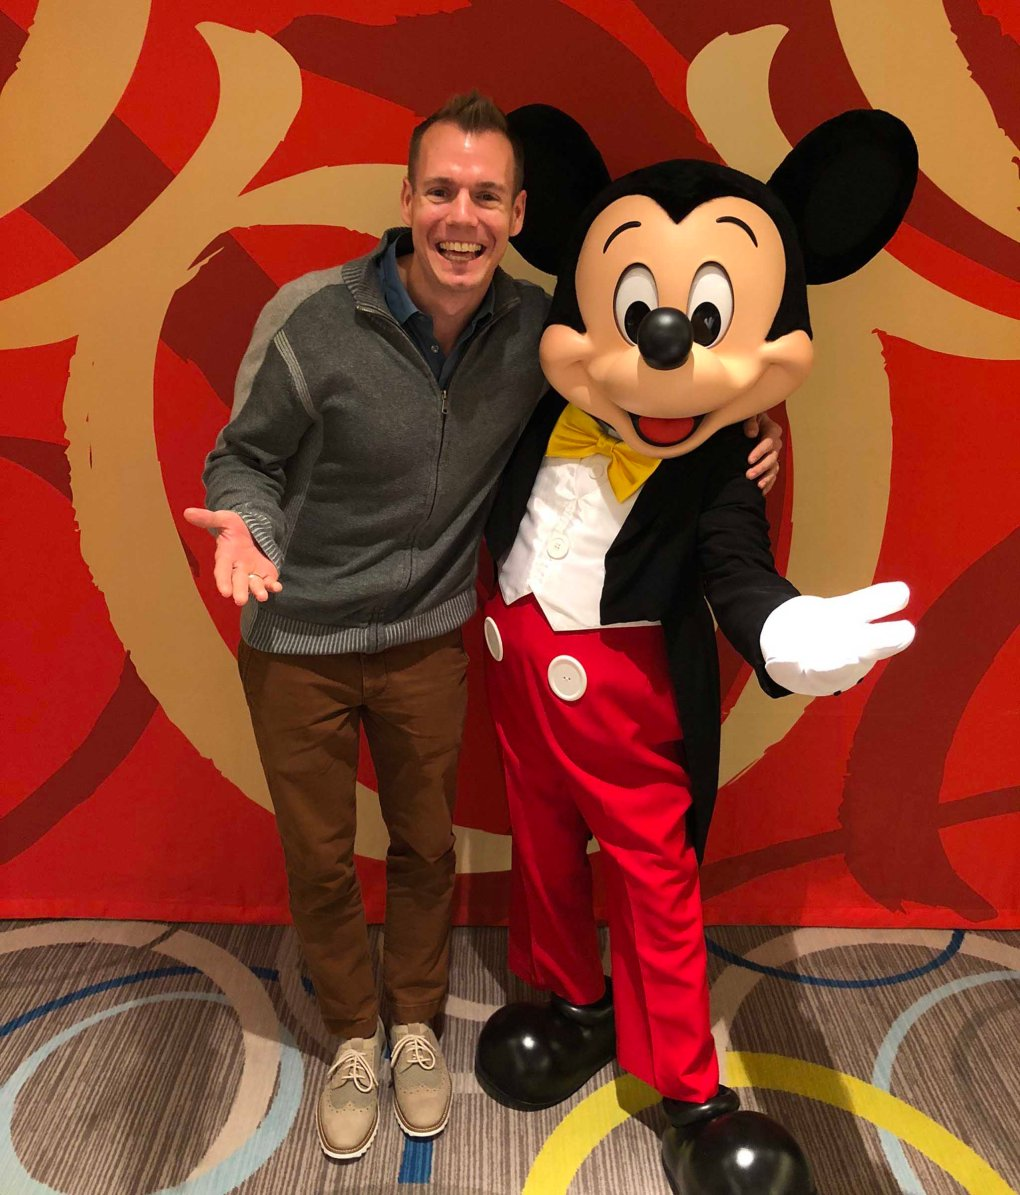 Magic Lamp Vacations plans Disney vacations for LGBTQ families and individuals